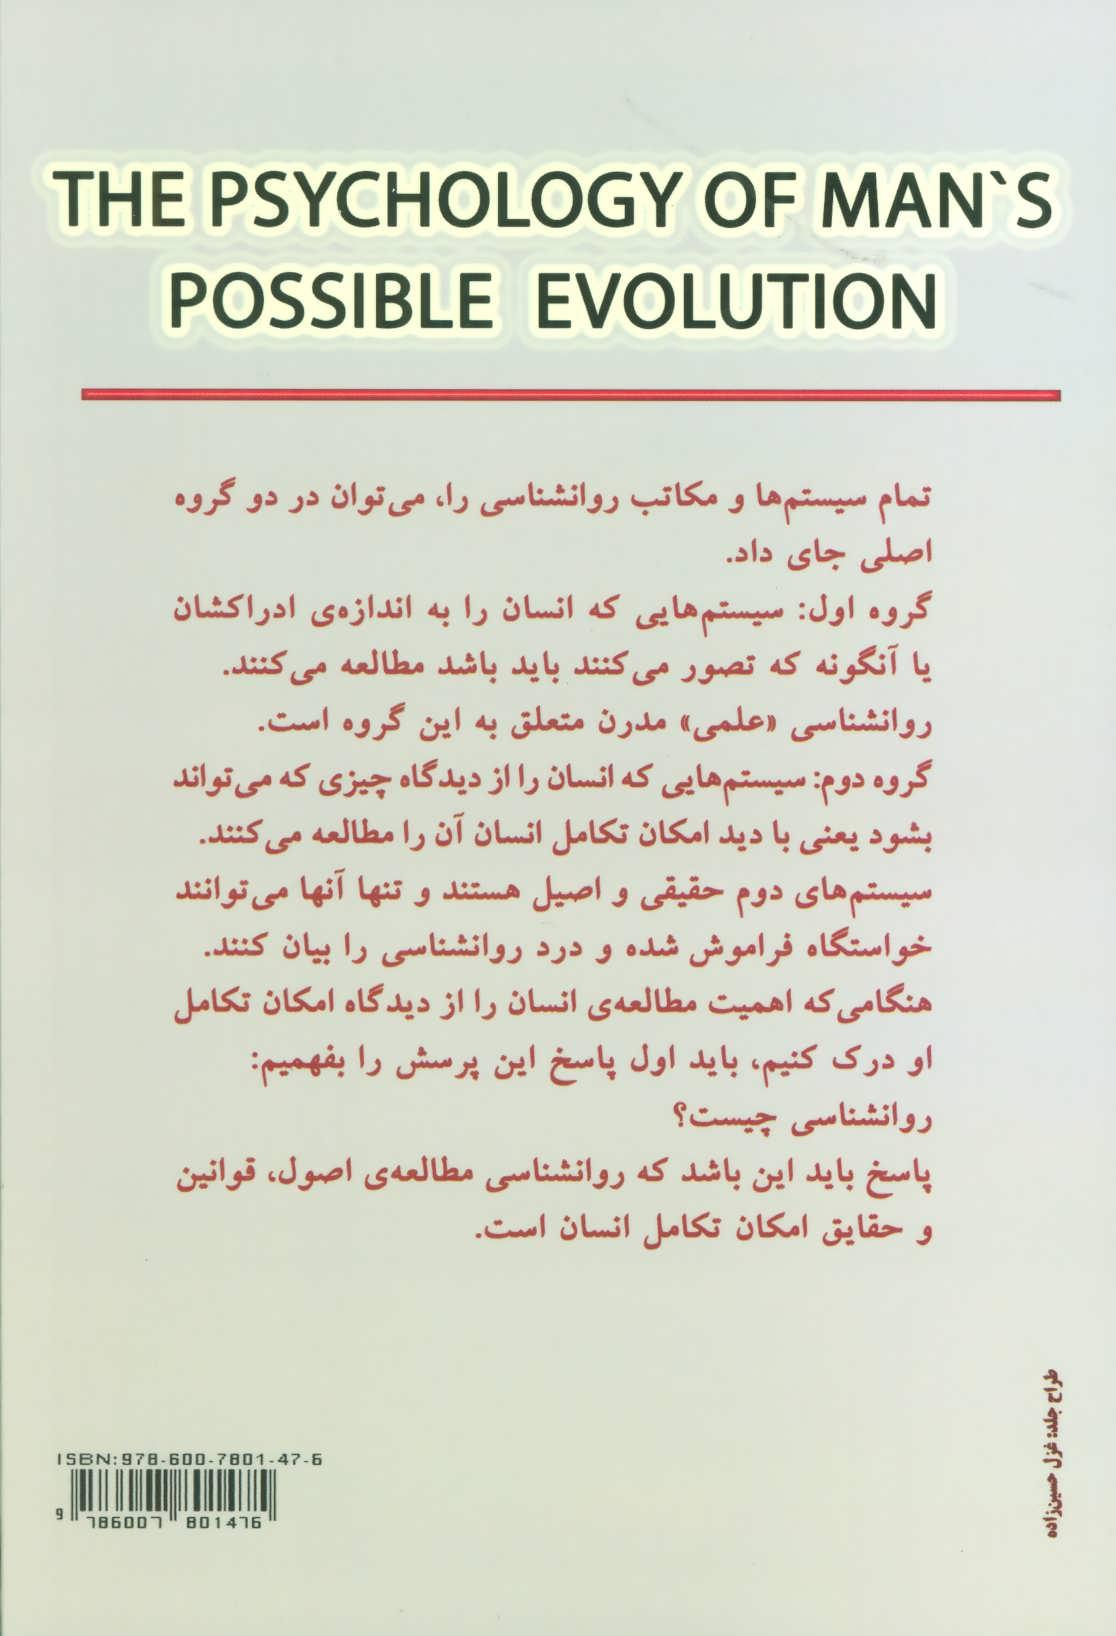 تکامل آگاهانه انسان